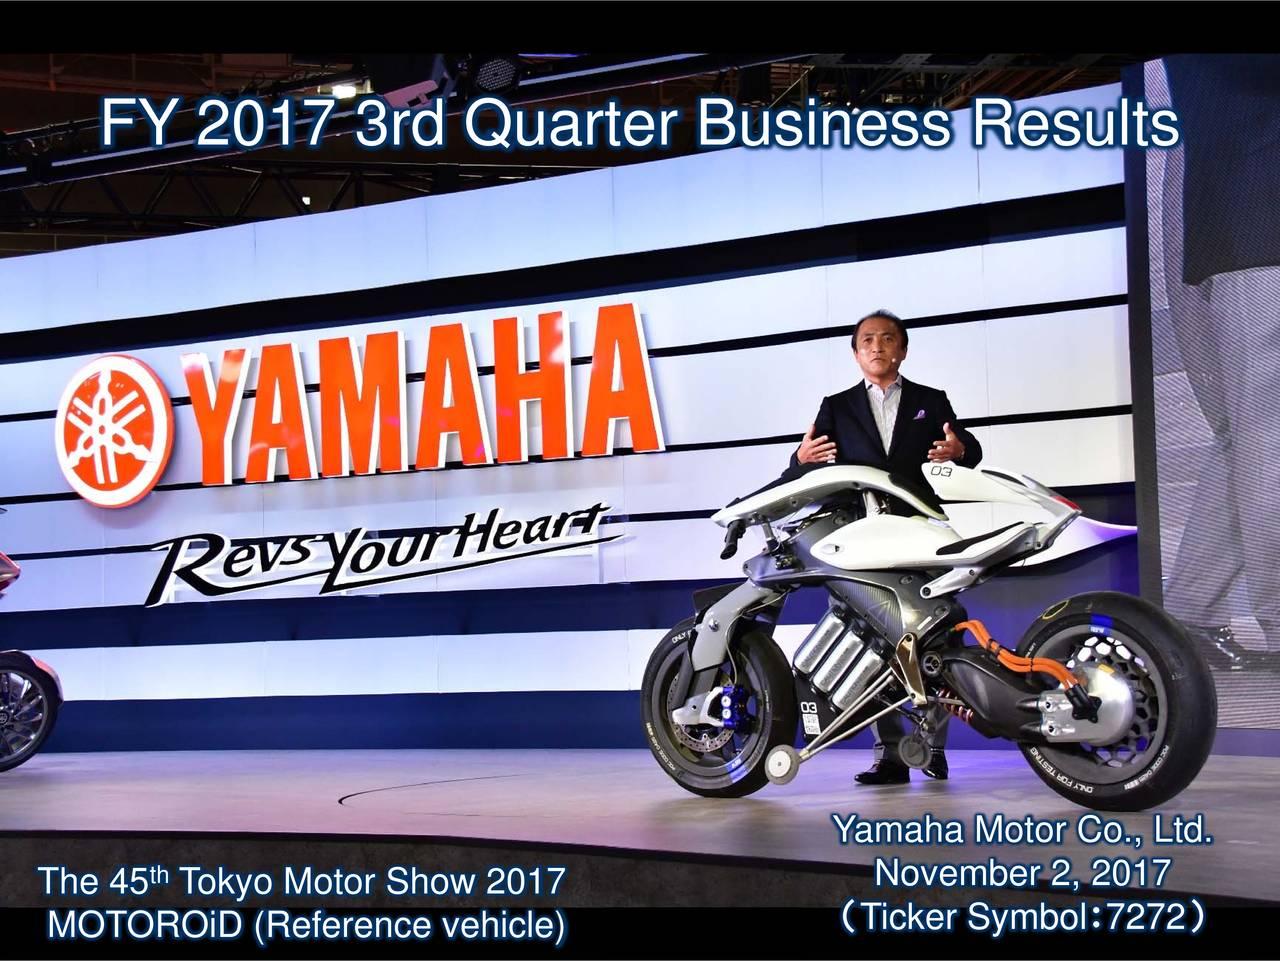 hight resolution of yamaha motor co ltd adr 2017 q3 results earnings call slides